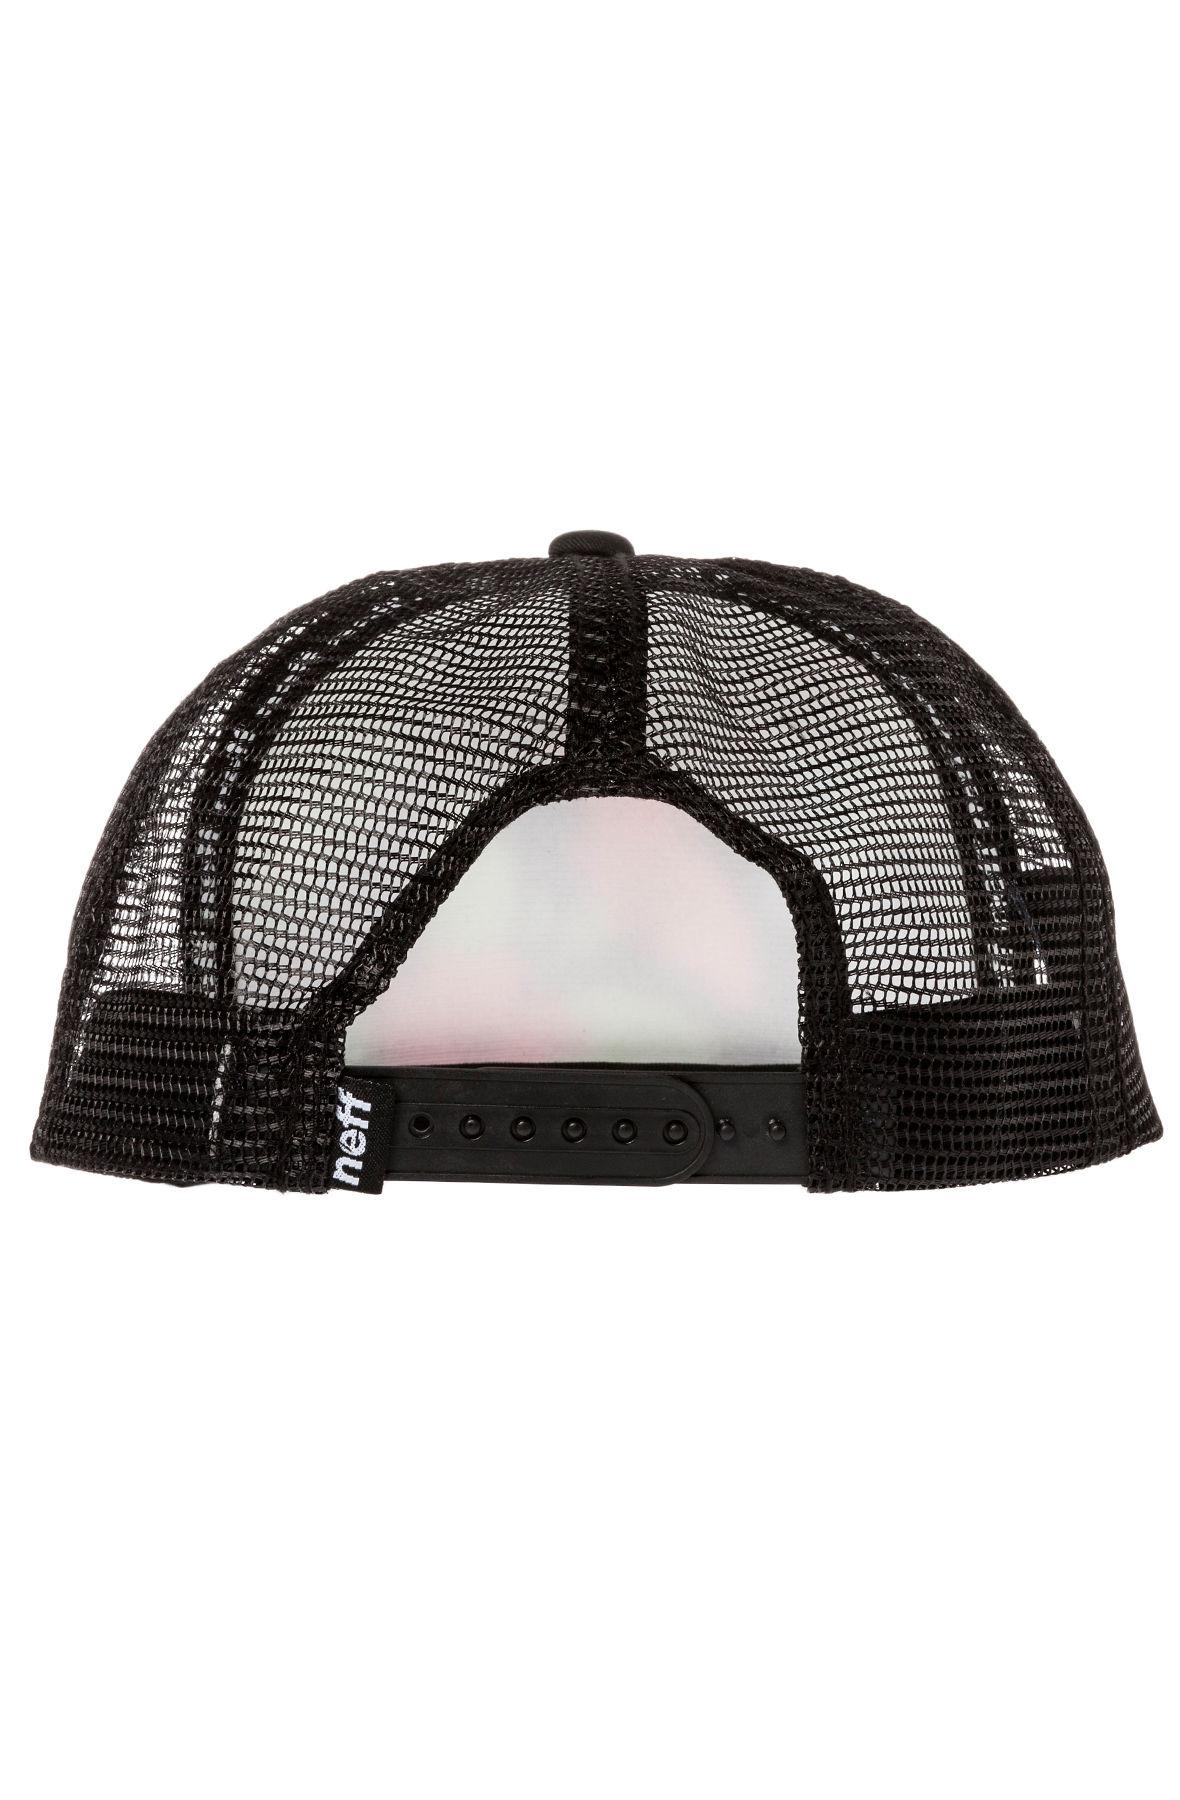 Lyst - Neff The Hawk Trucker Hat for Men 8e31f146dd68